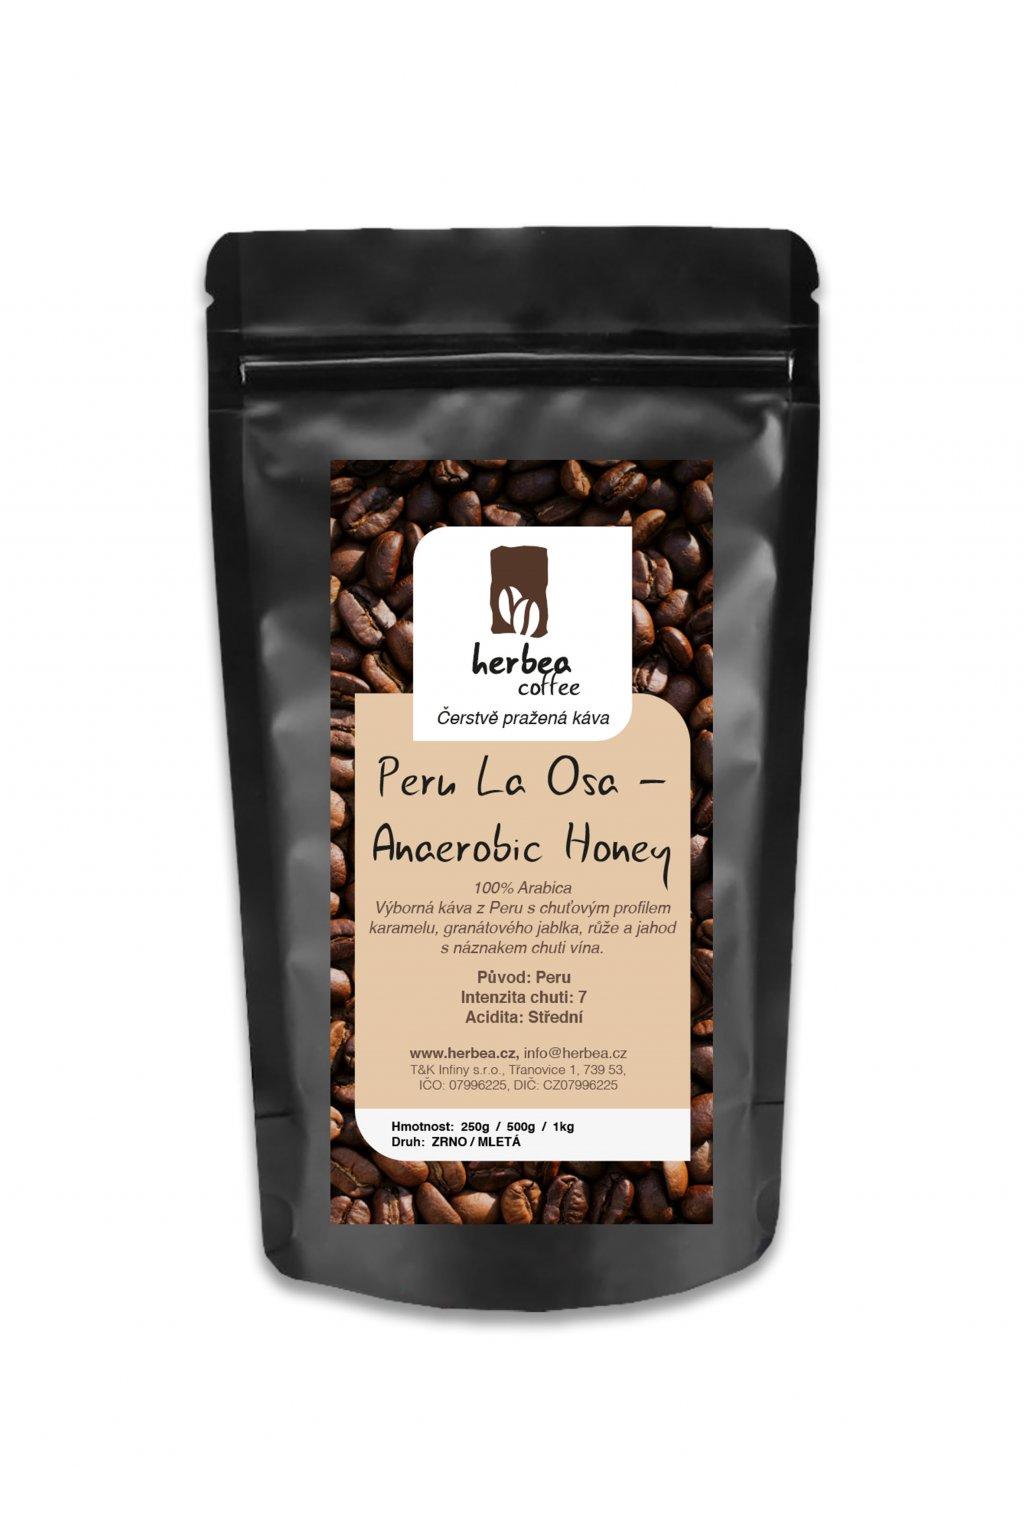 Peru La Osa – Anaerobic Honey nah